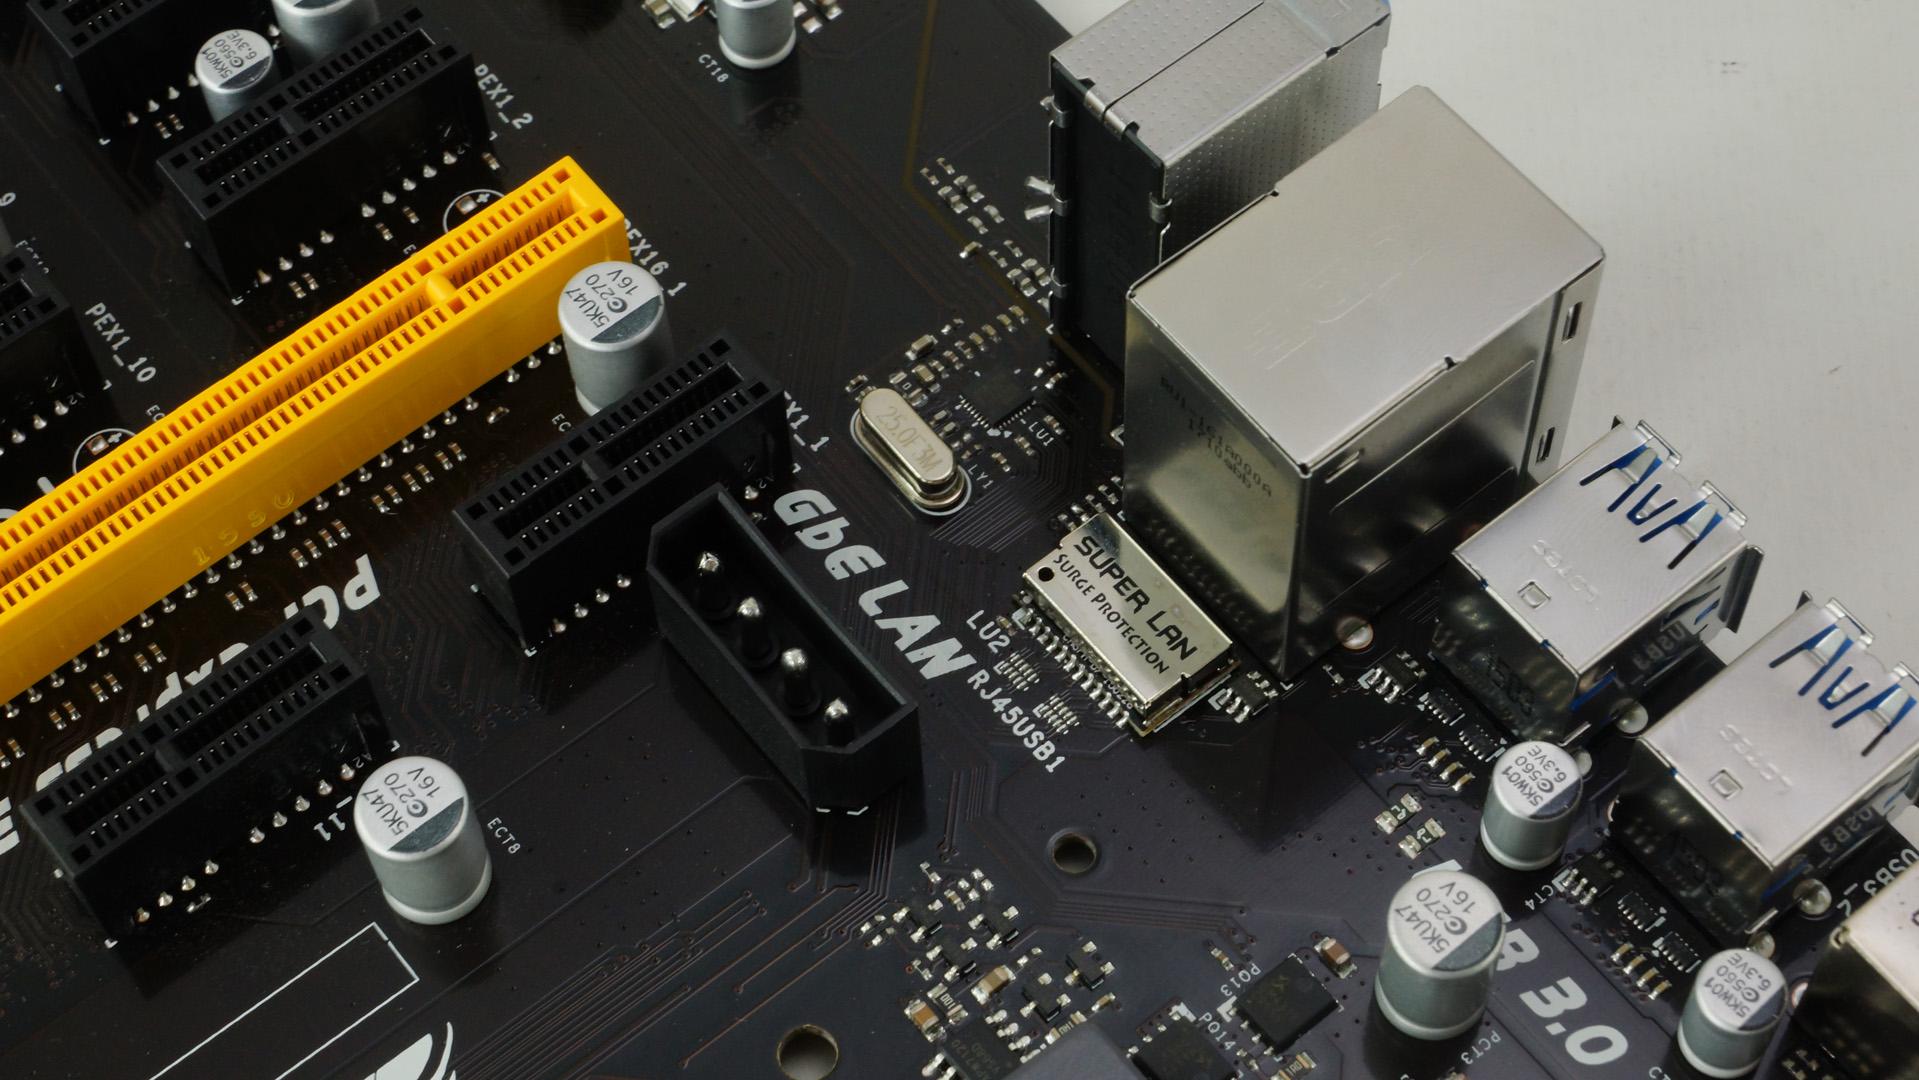 Tb250 Btc Pro The 12 Gpu Ready Crypto Mining Motherboard Mobo Biostar Dsc01287 1024x576